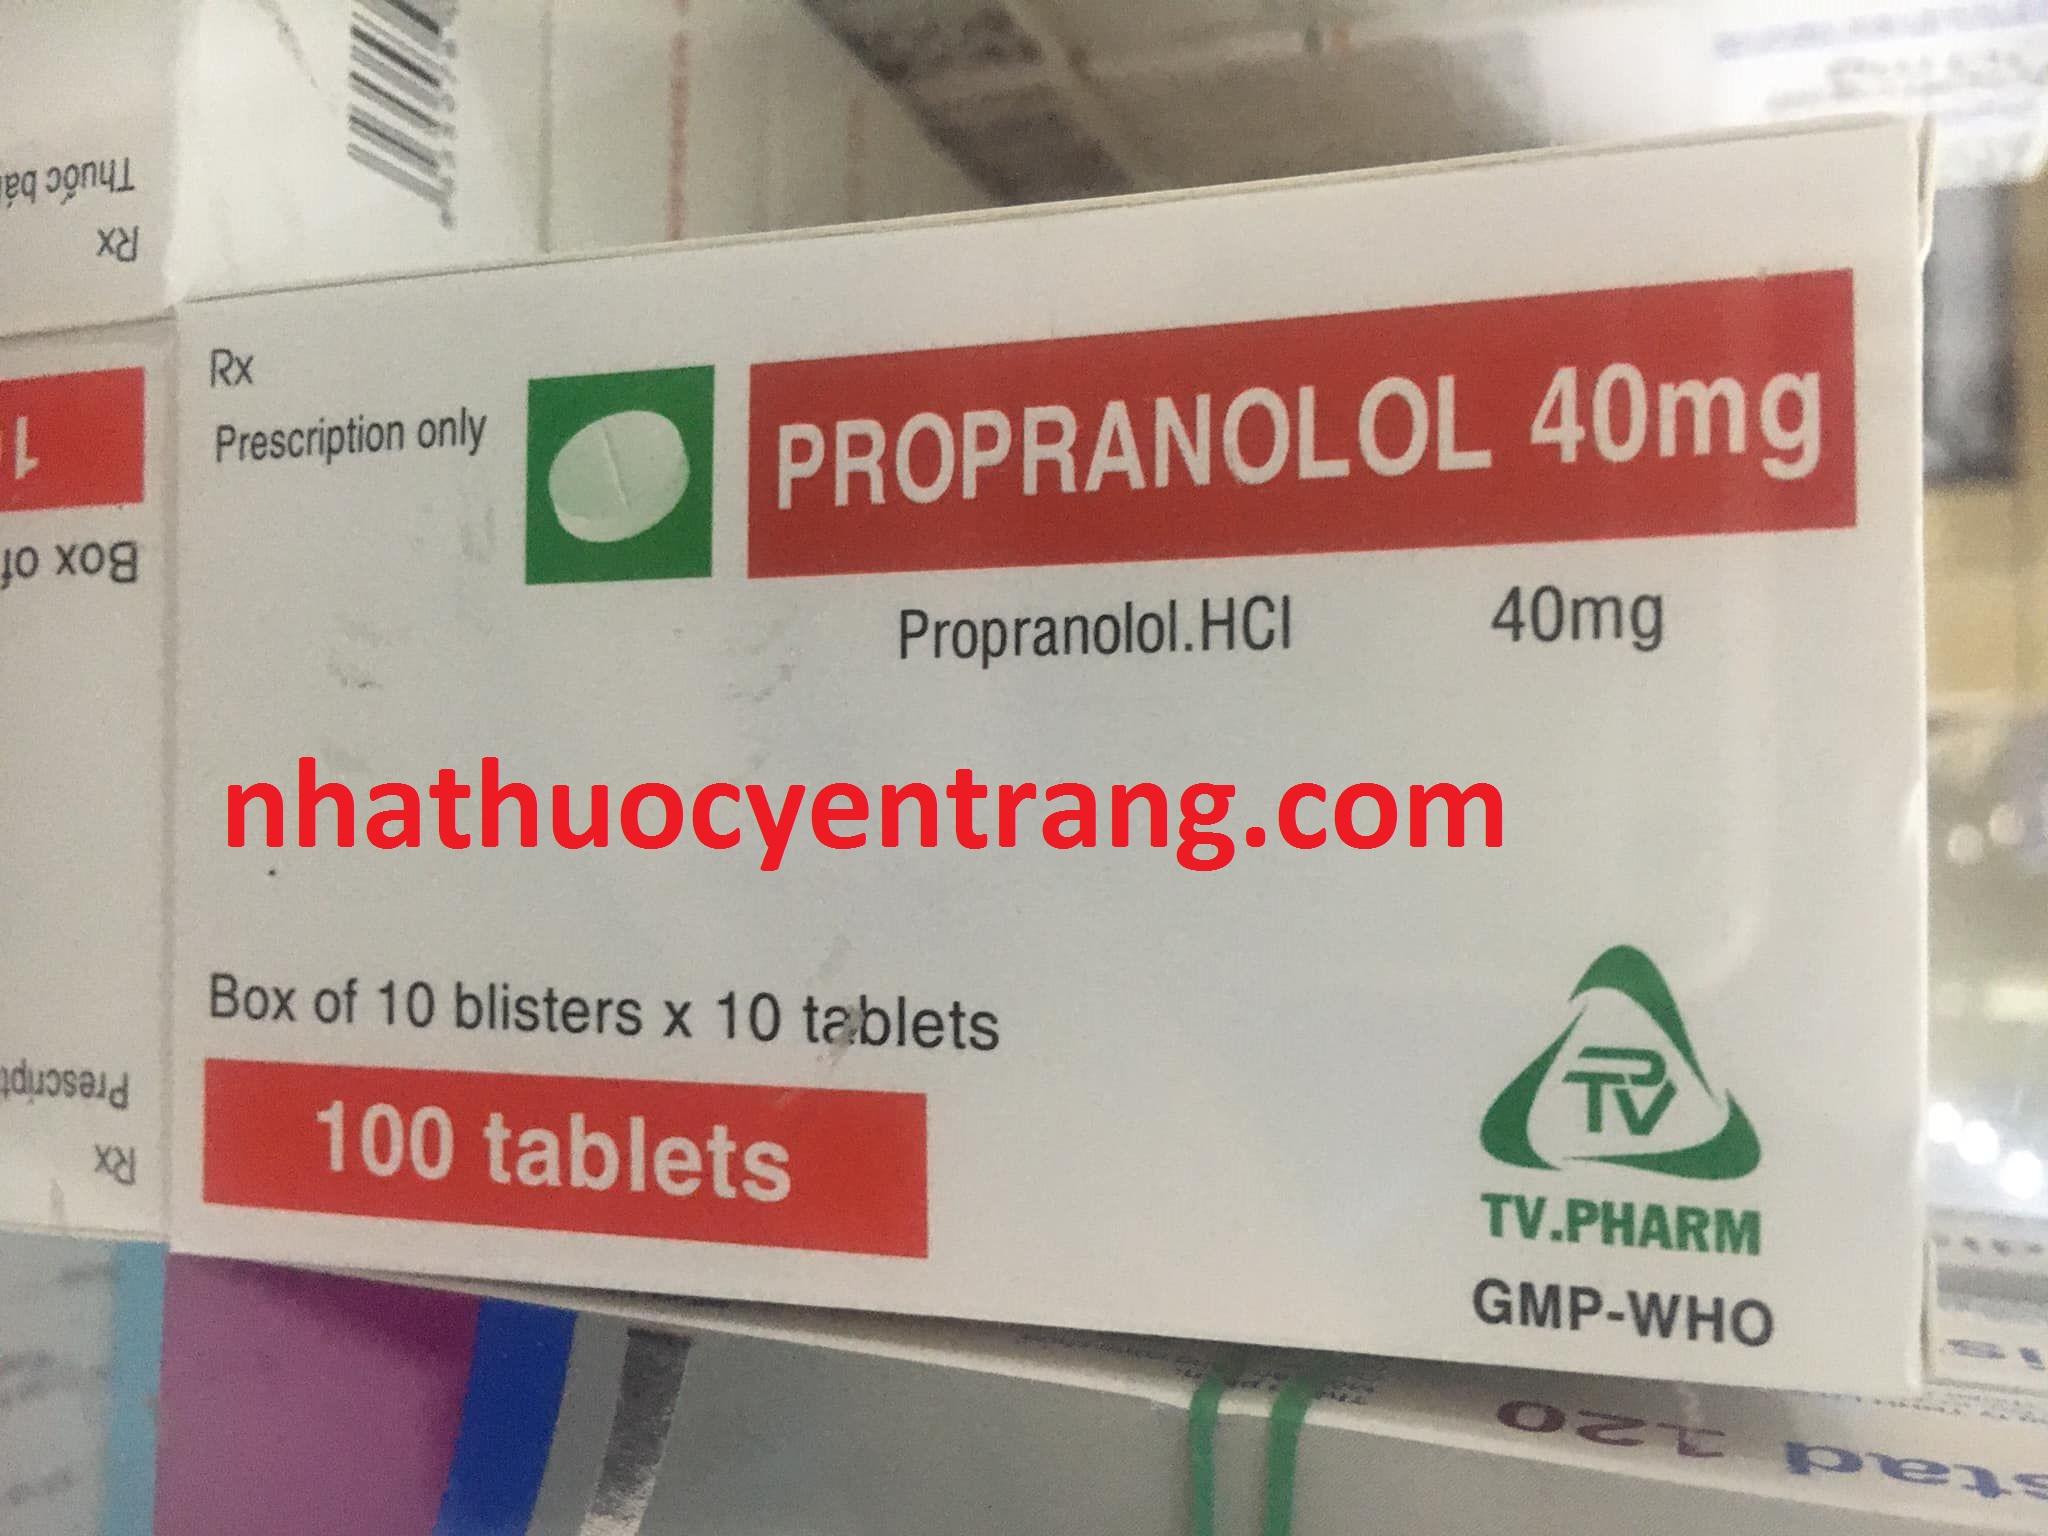 Propranolol 40mg